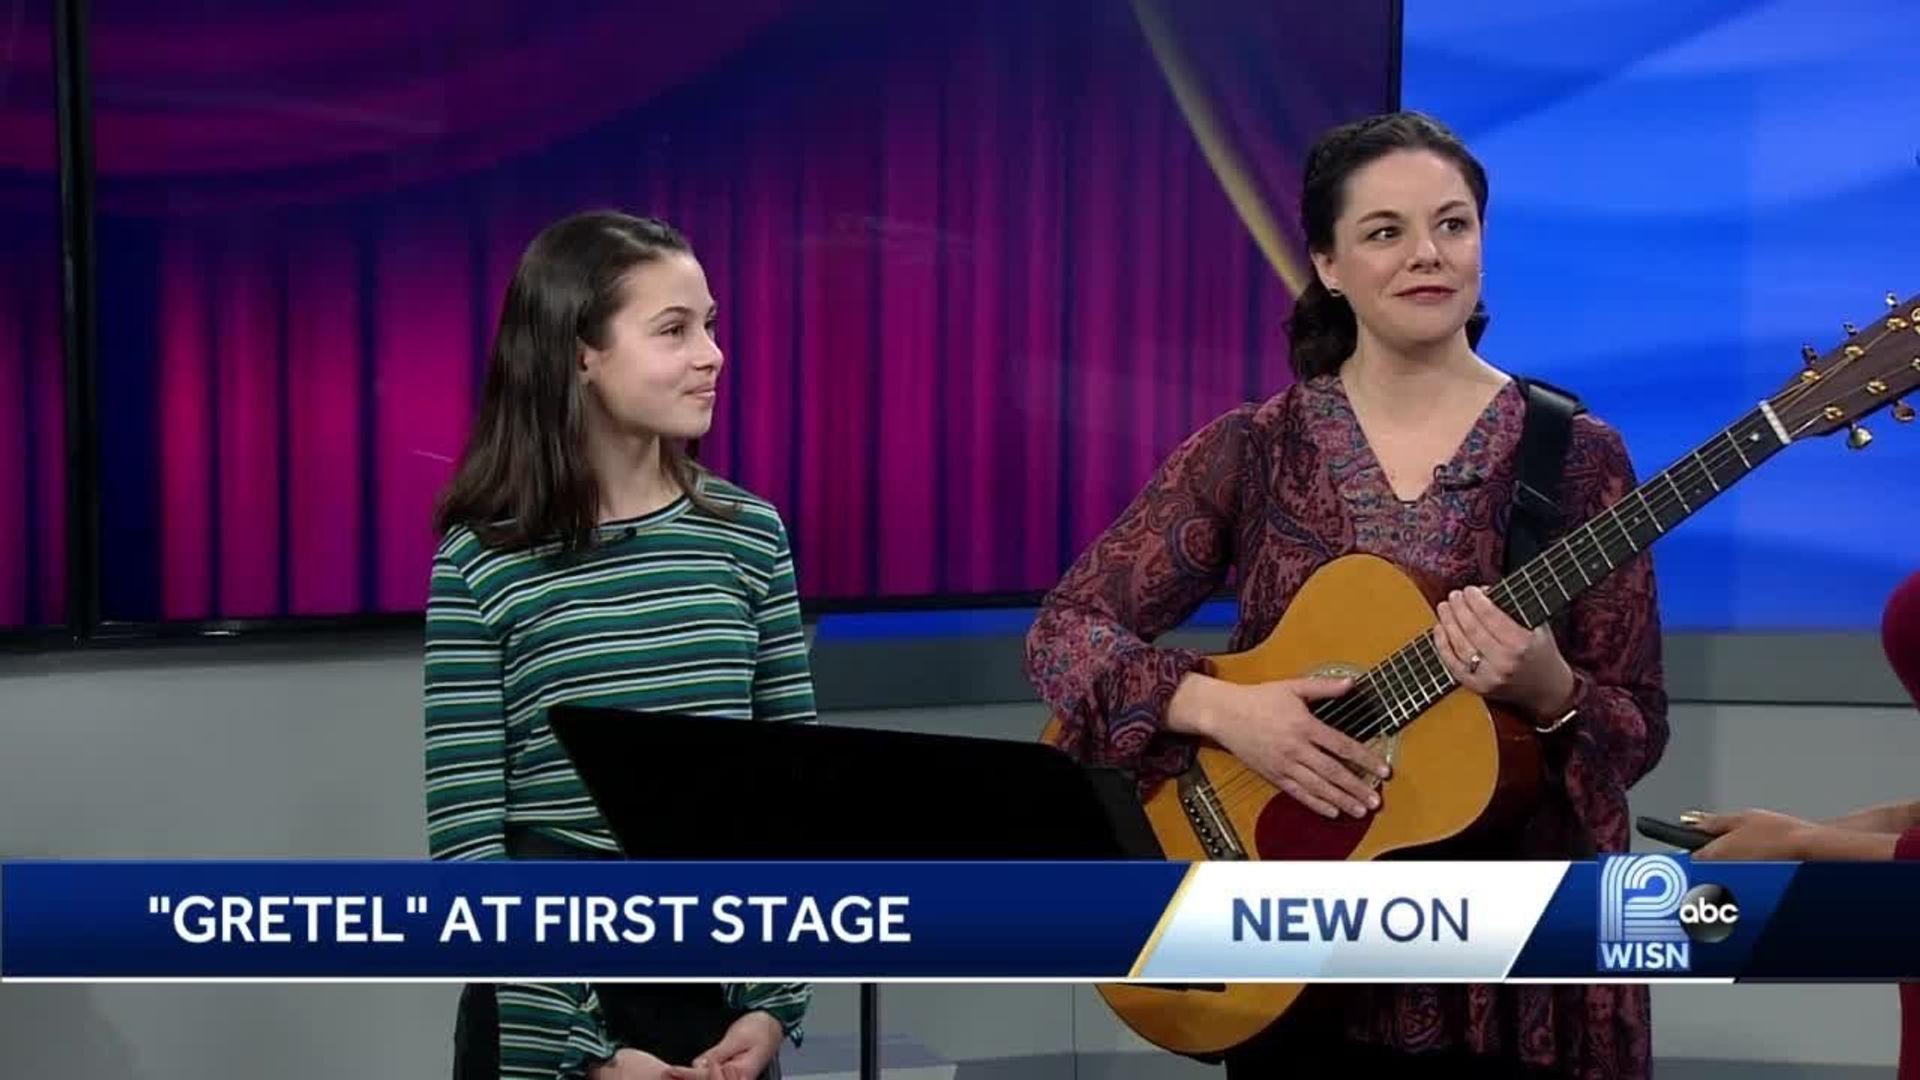 Preview of new folk rock musical: Gretel